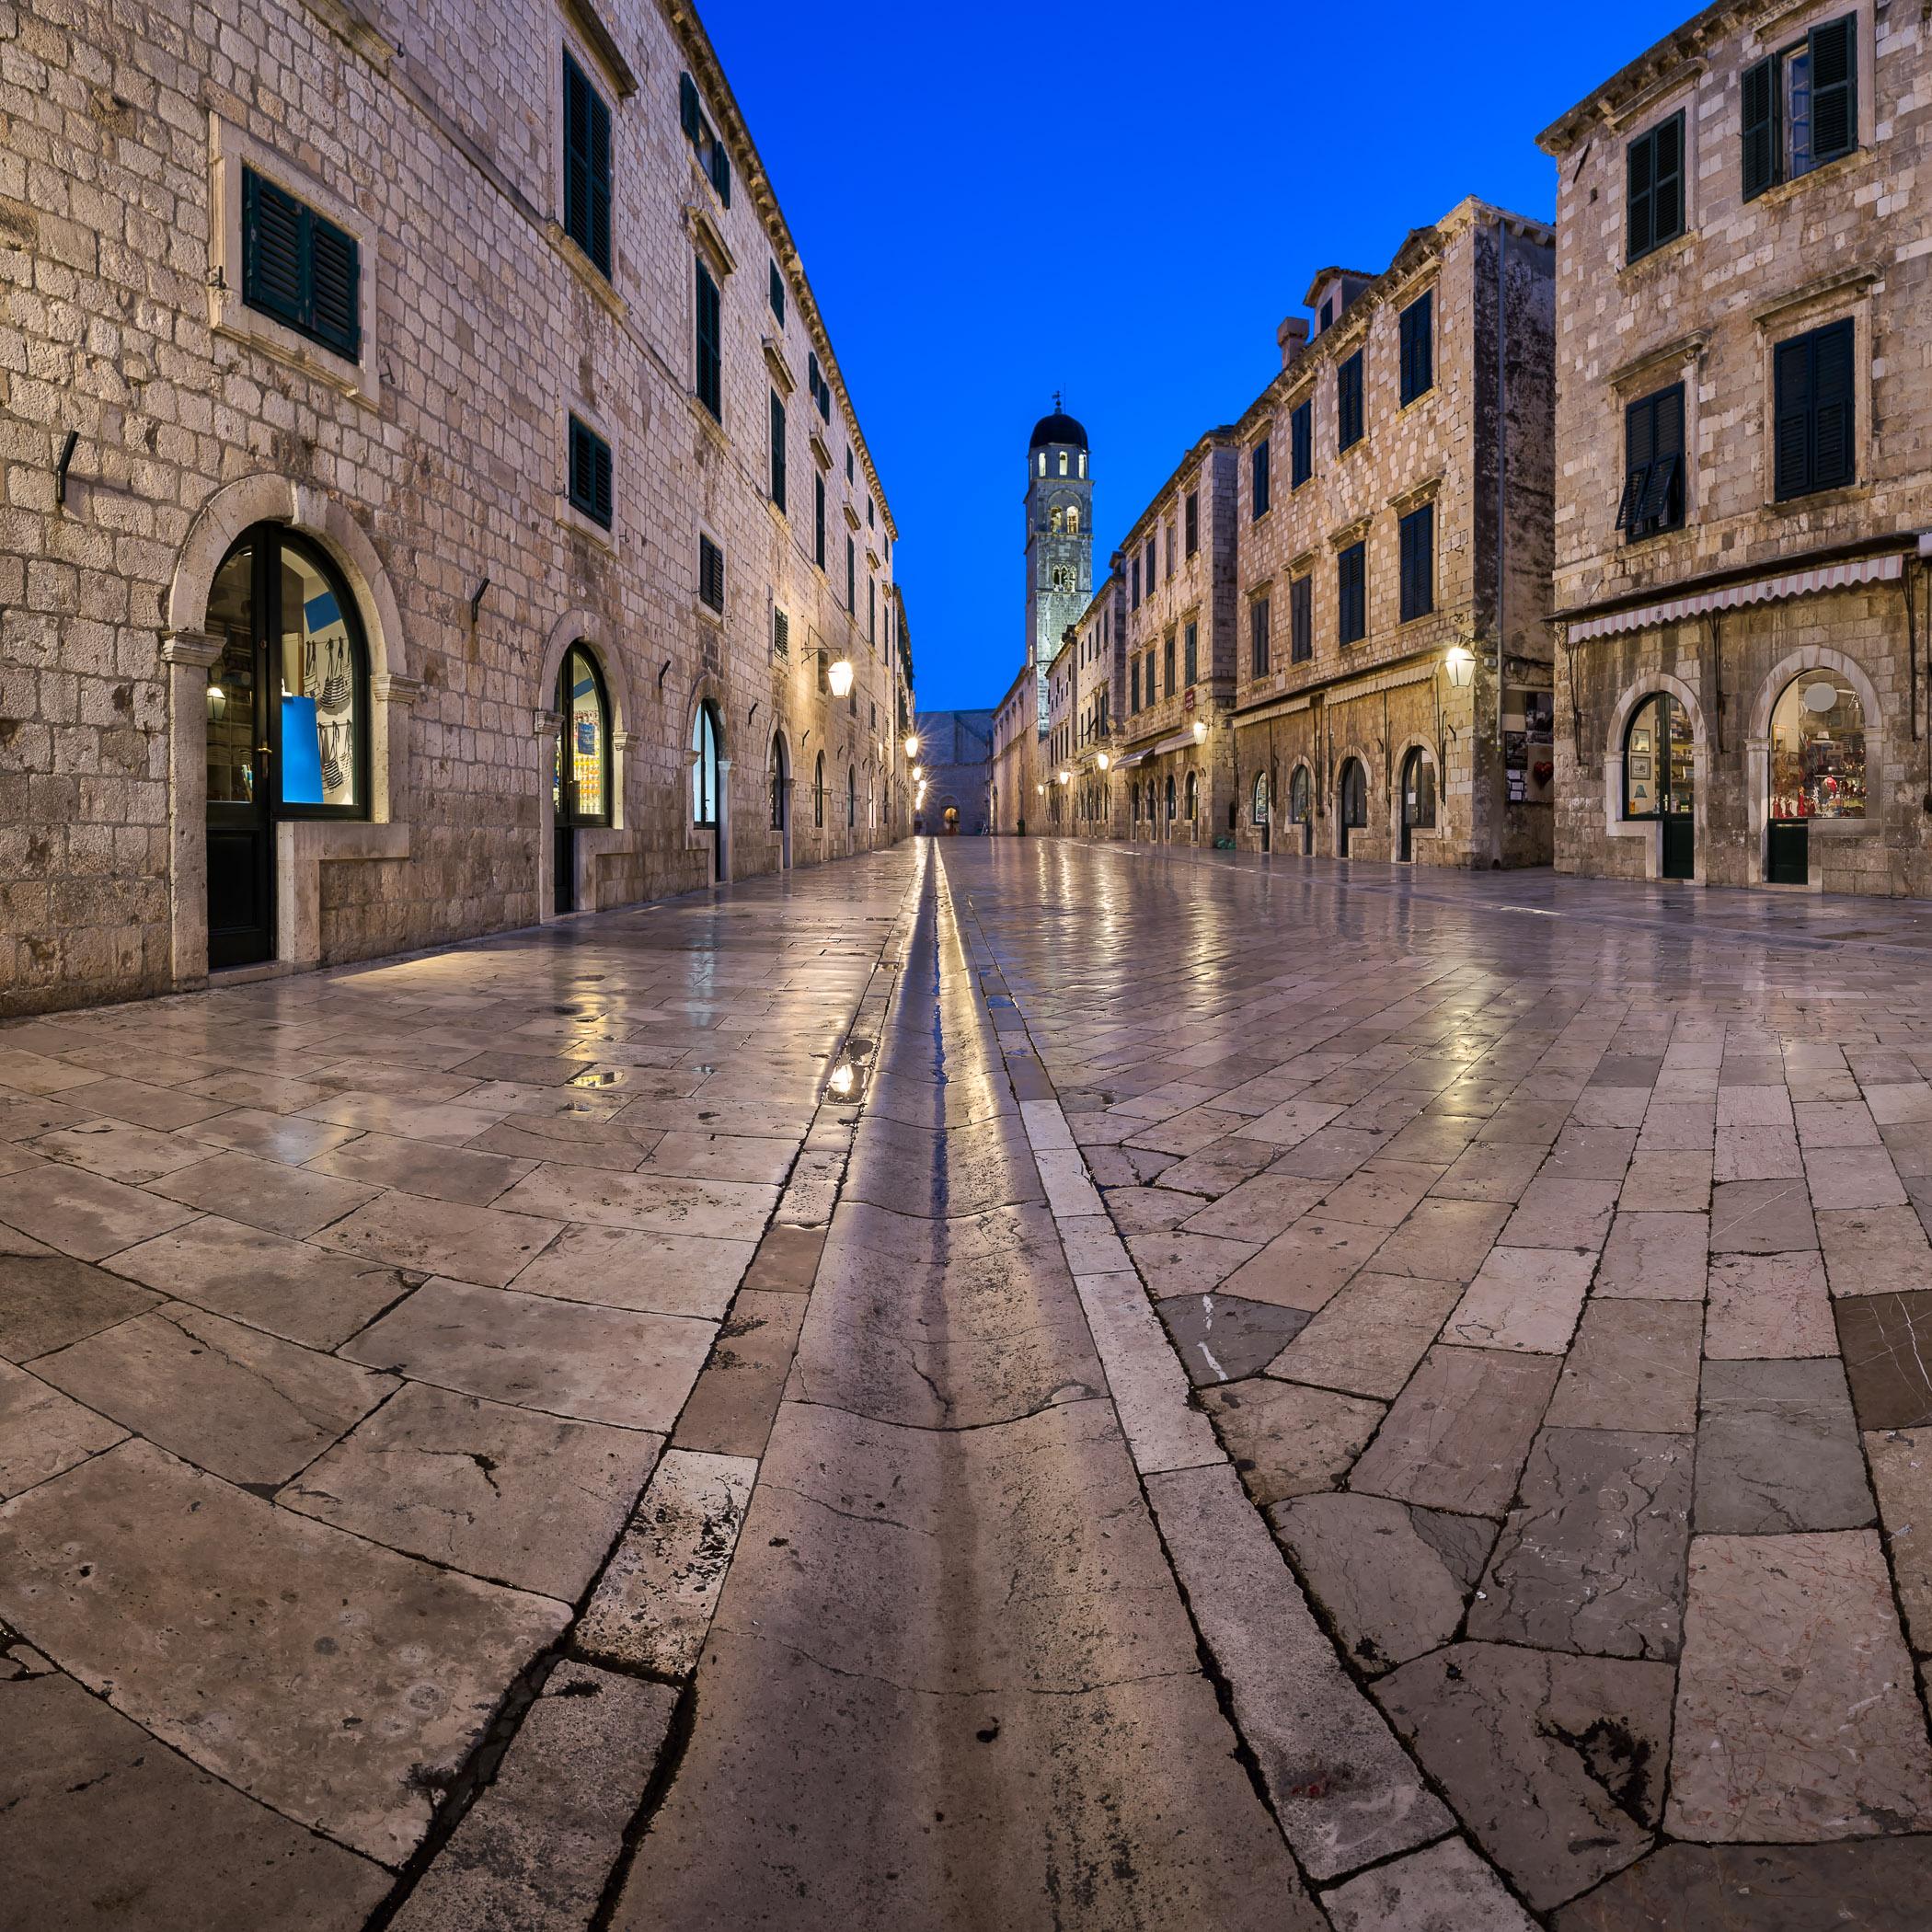 Panorama of Stradun Street in the Morning, Dubrovnik, Dalmatia, Croatia